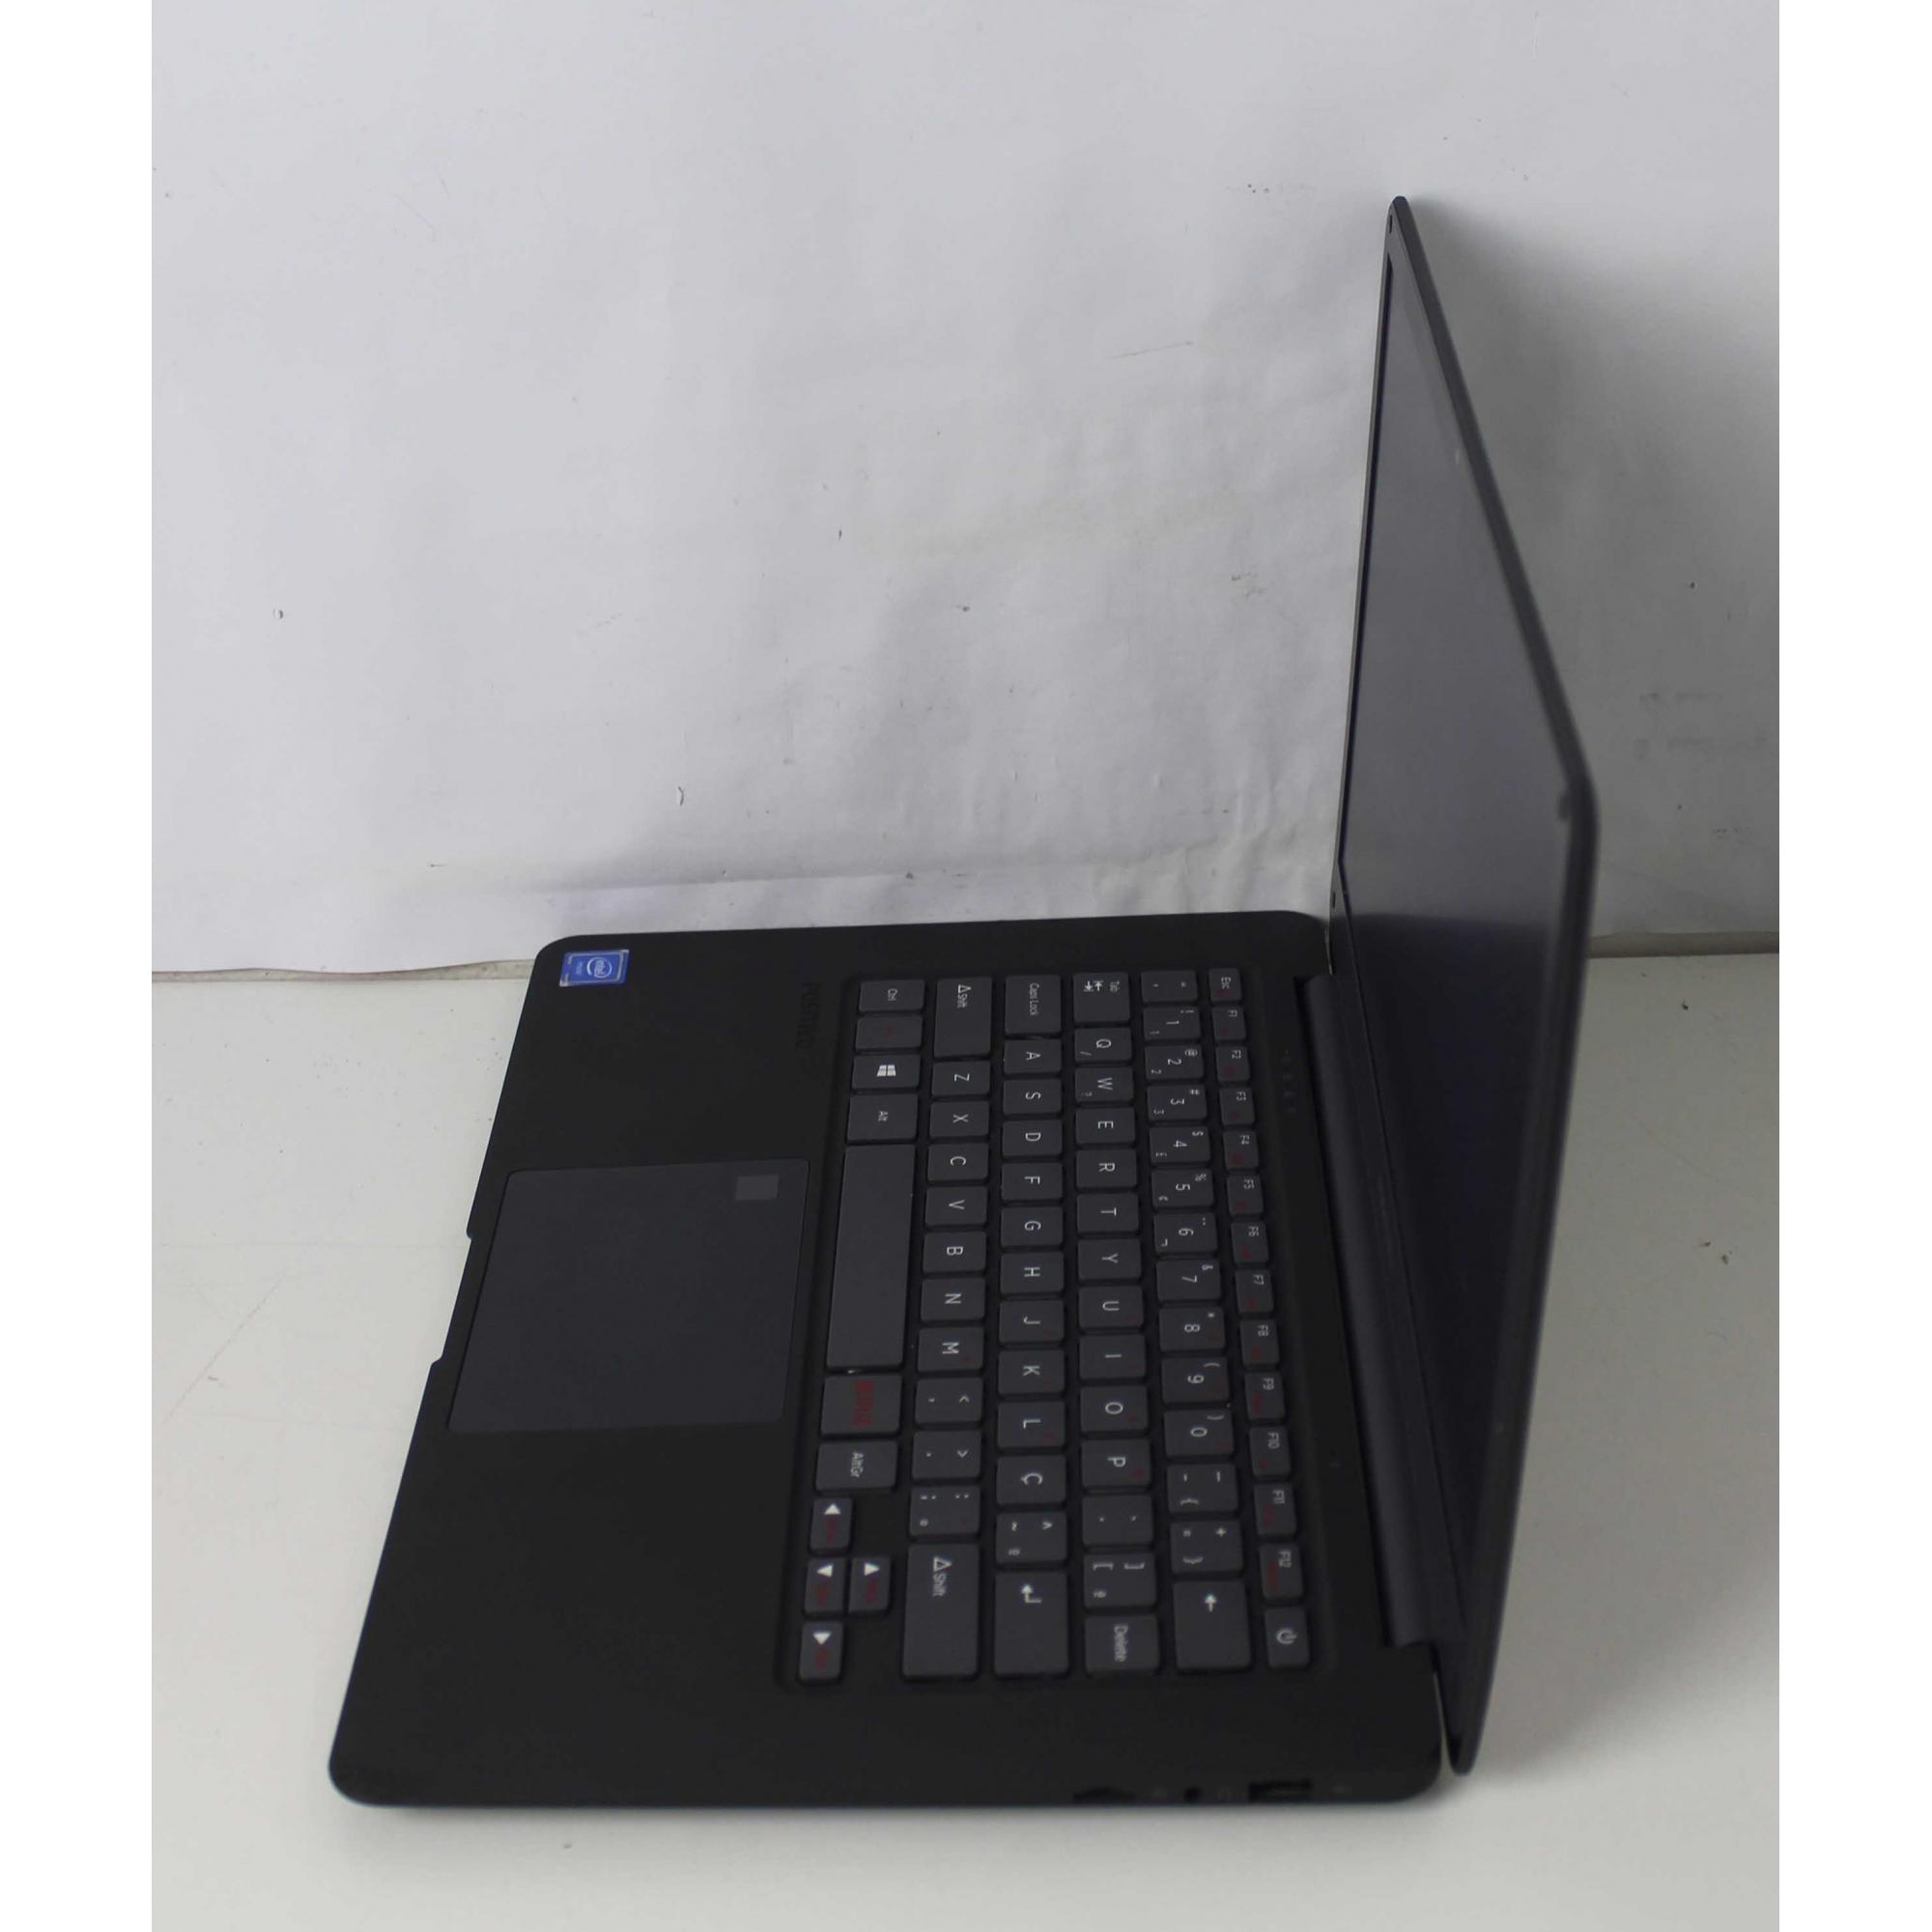 "Notebook Positivo Motion Plus Q432A 14"" Intel Atom 1.44GHz 4GB SSD-32GB"